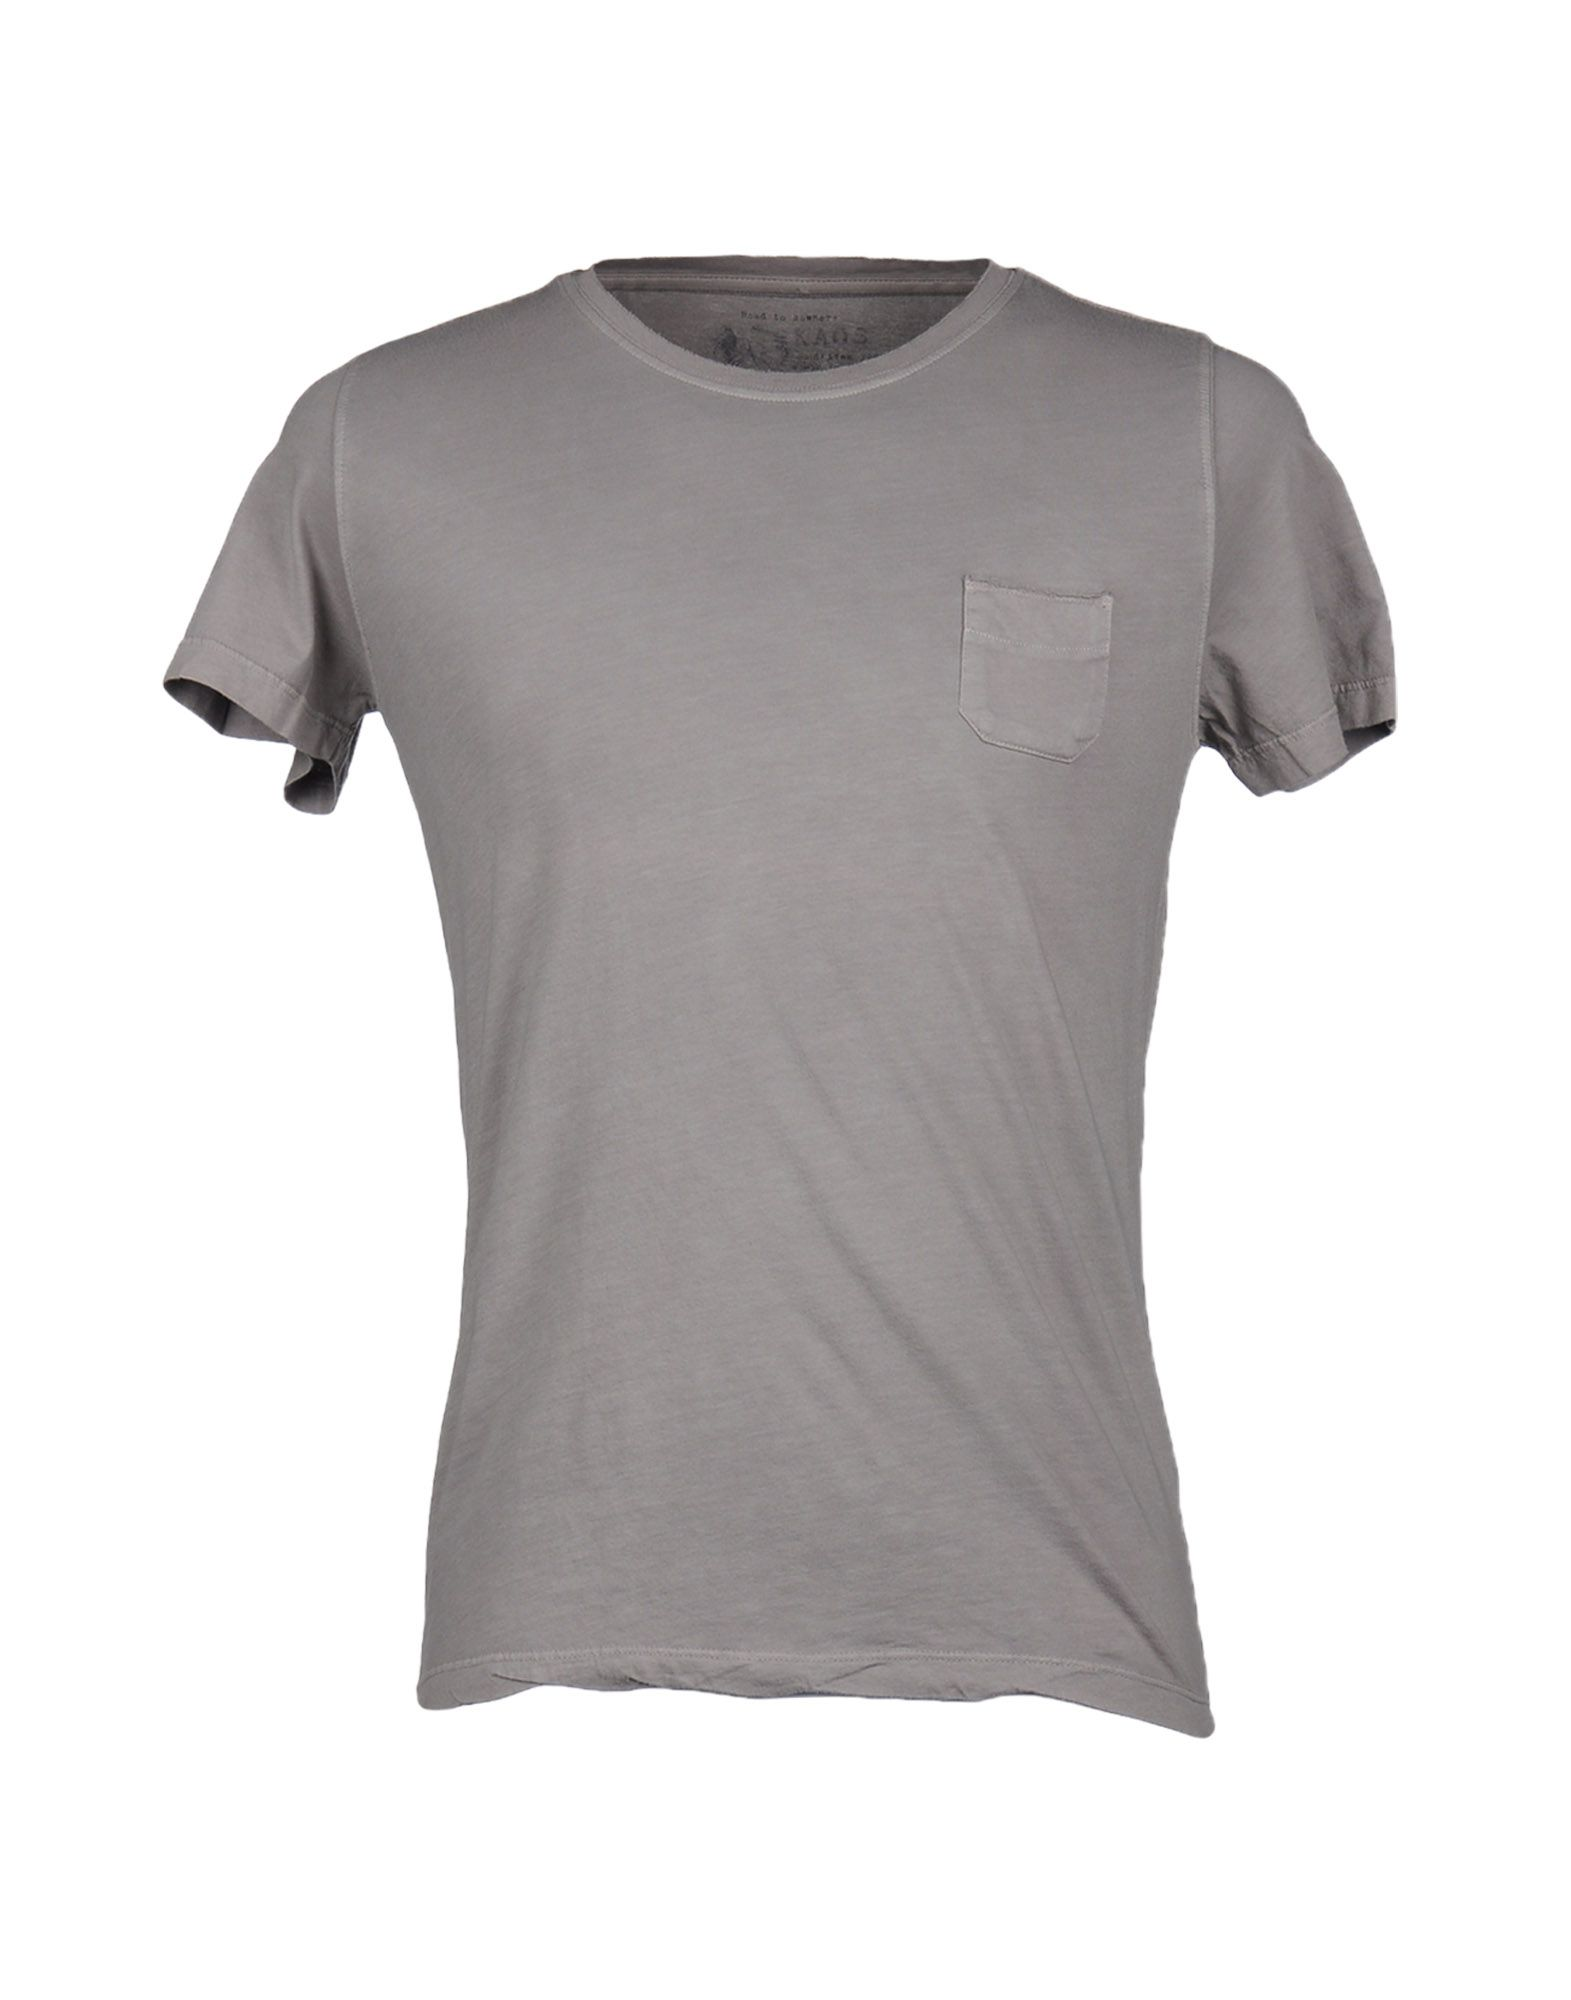 Kaos Short Sleeve T-shirt in Gray for Men (Grey)   Lyst